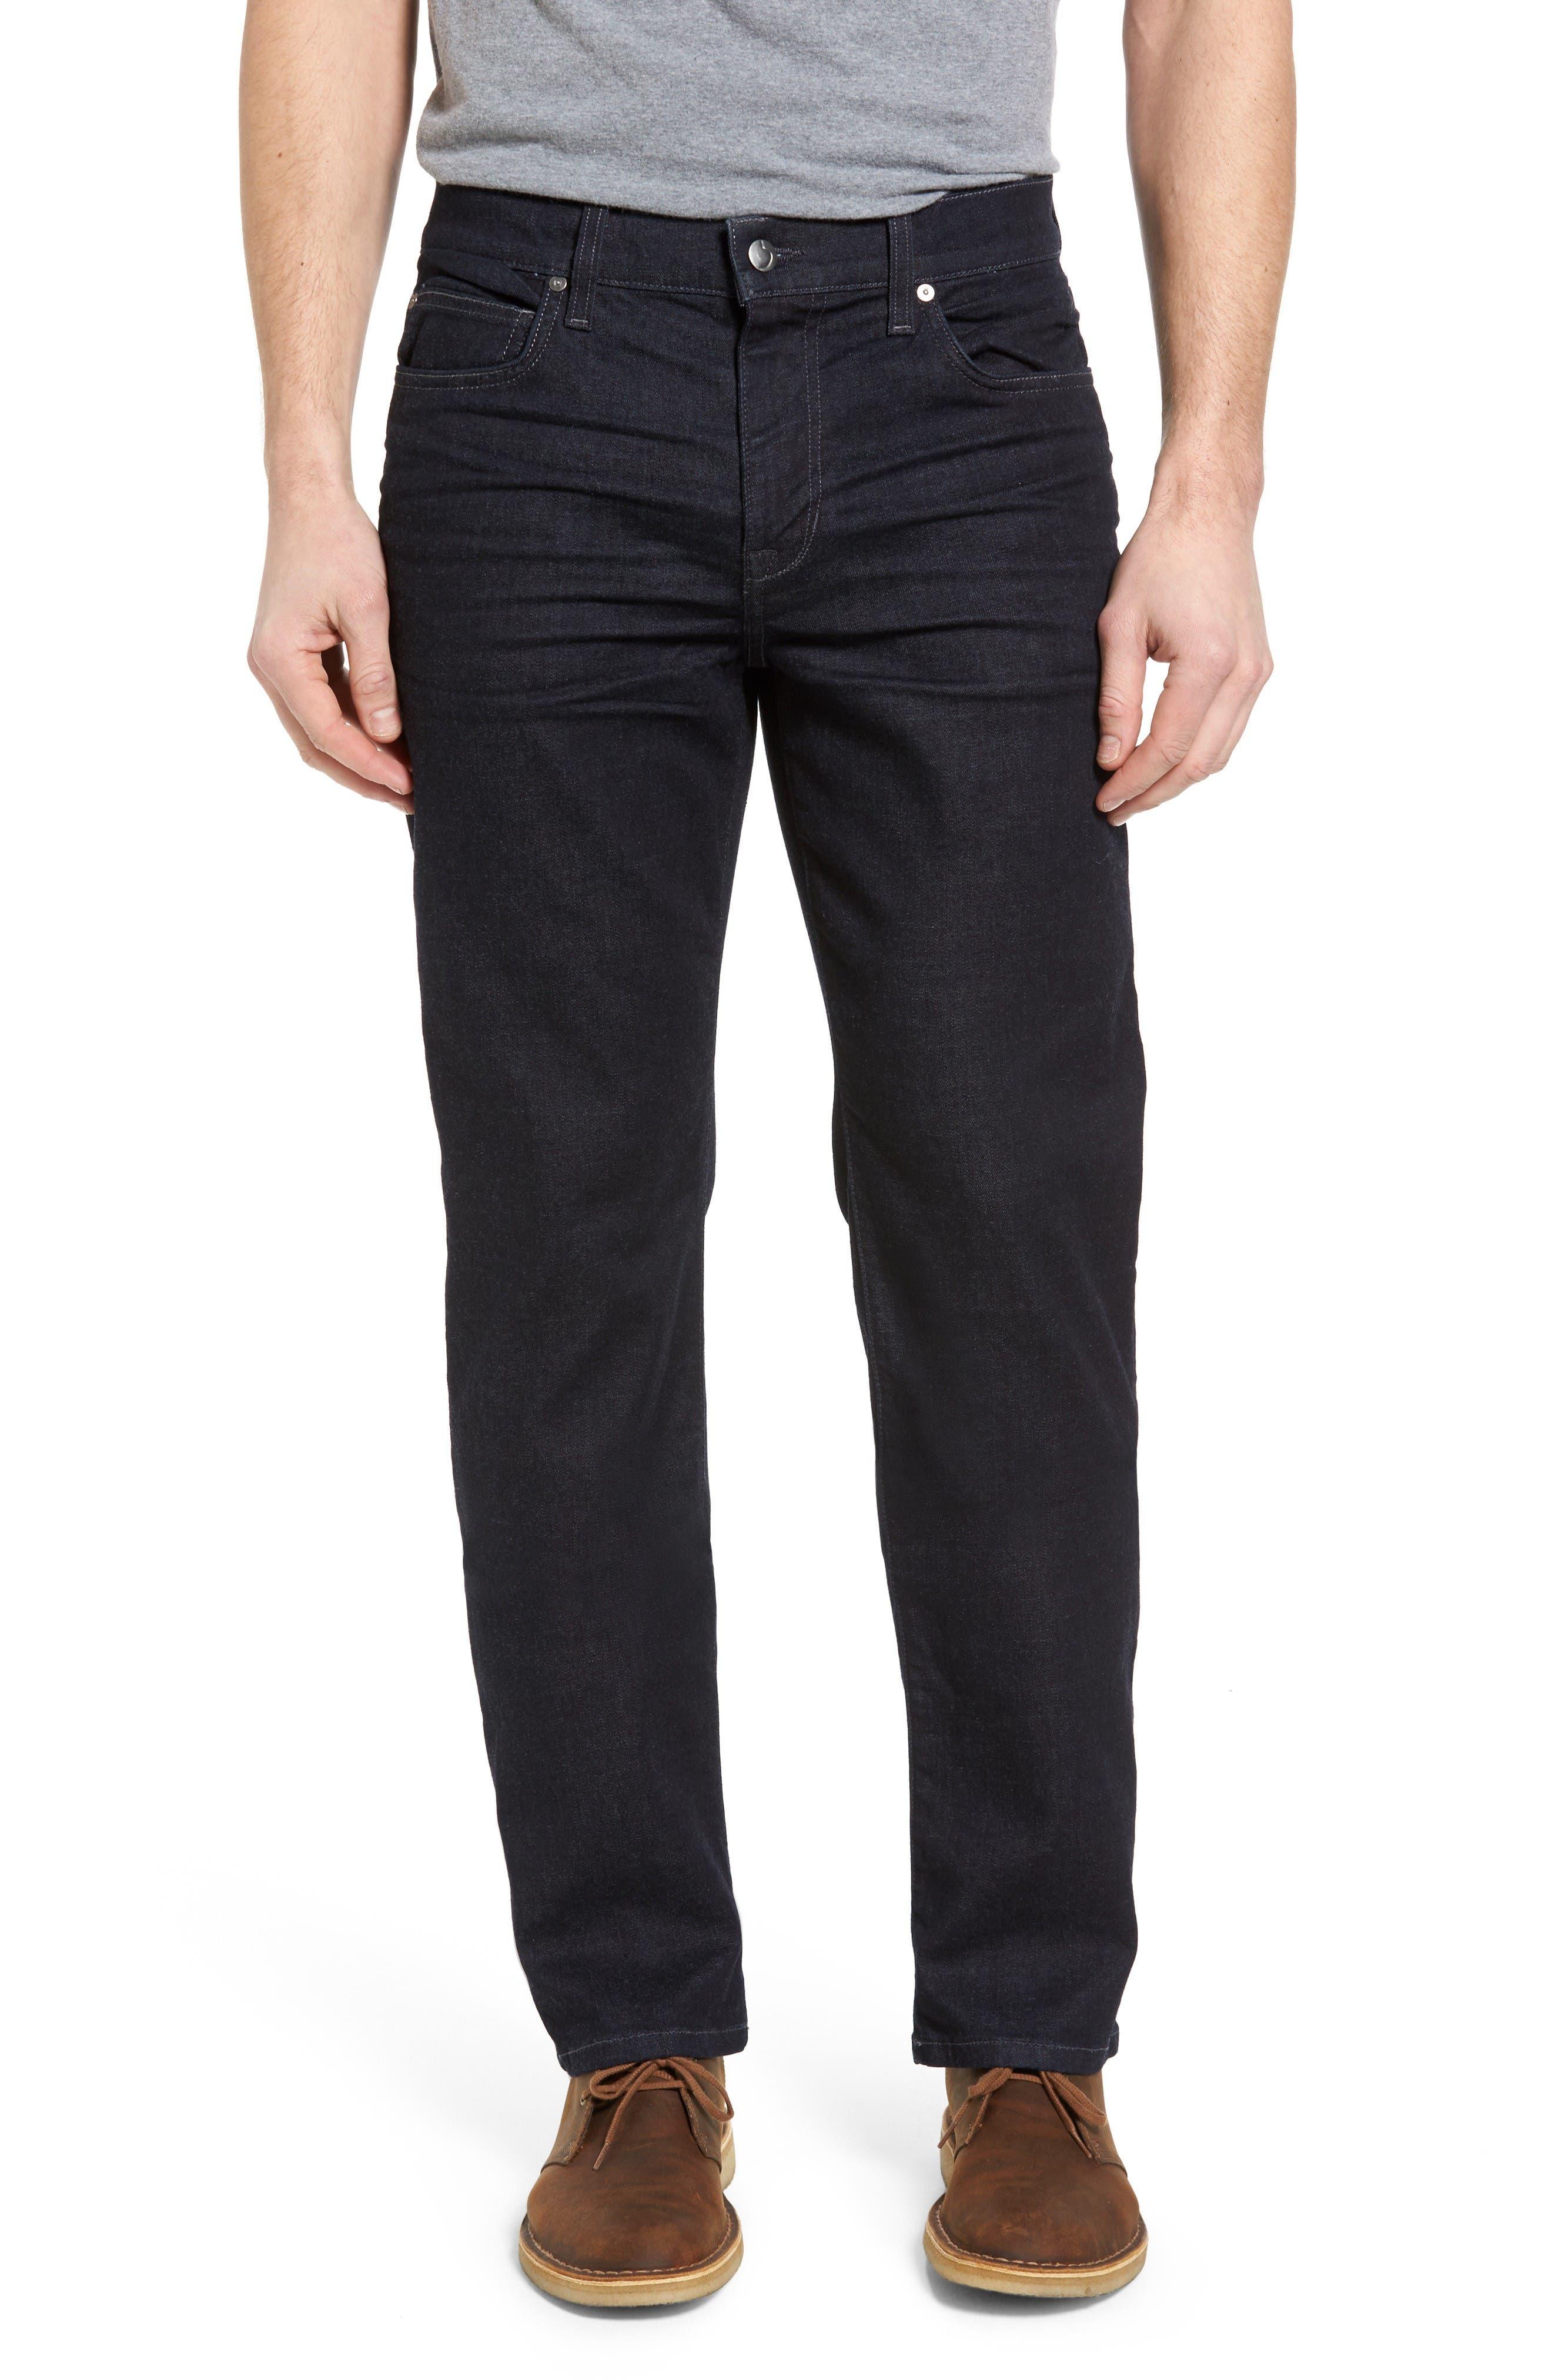 Alternate Image 1 Selected - Joe's Classic Straight Leg Jeans (Nuhollis)